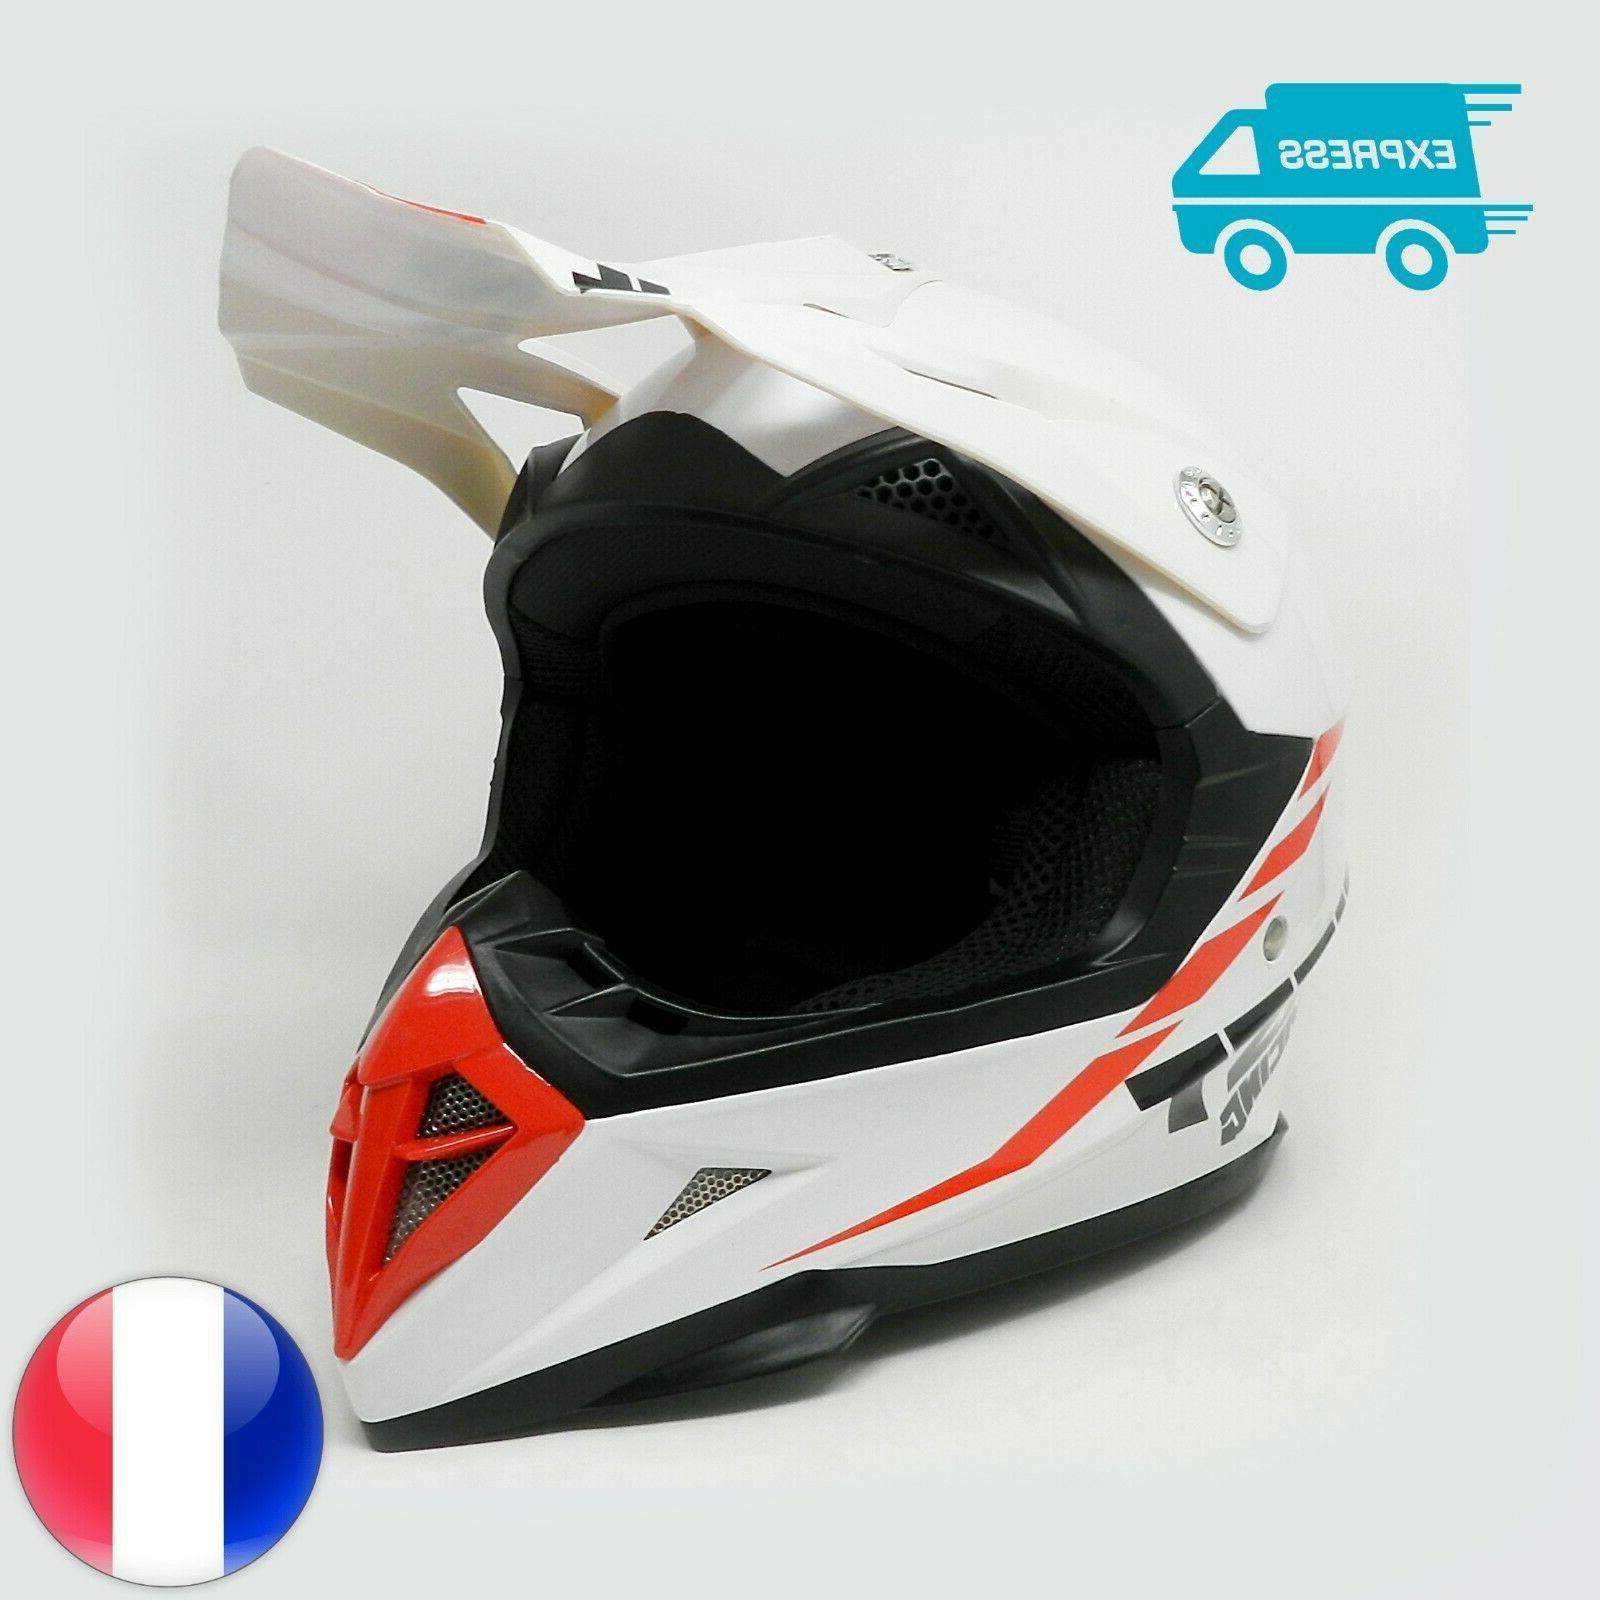 casque de moto enfant motocross cross off